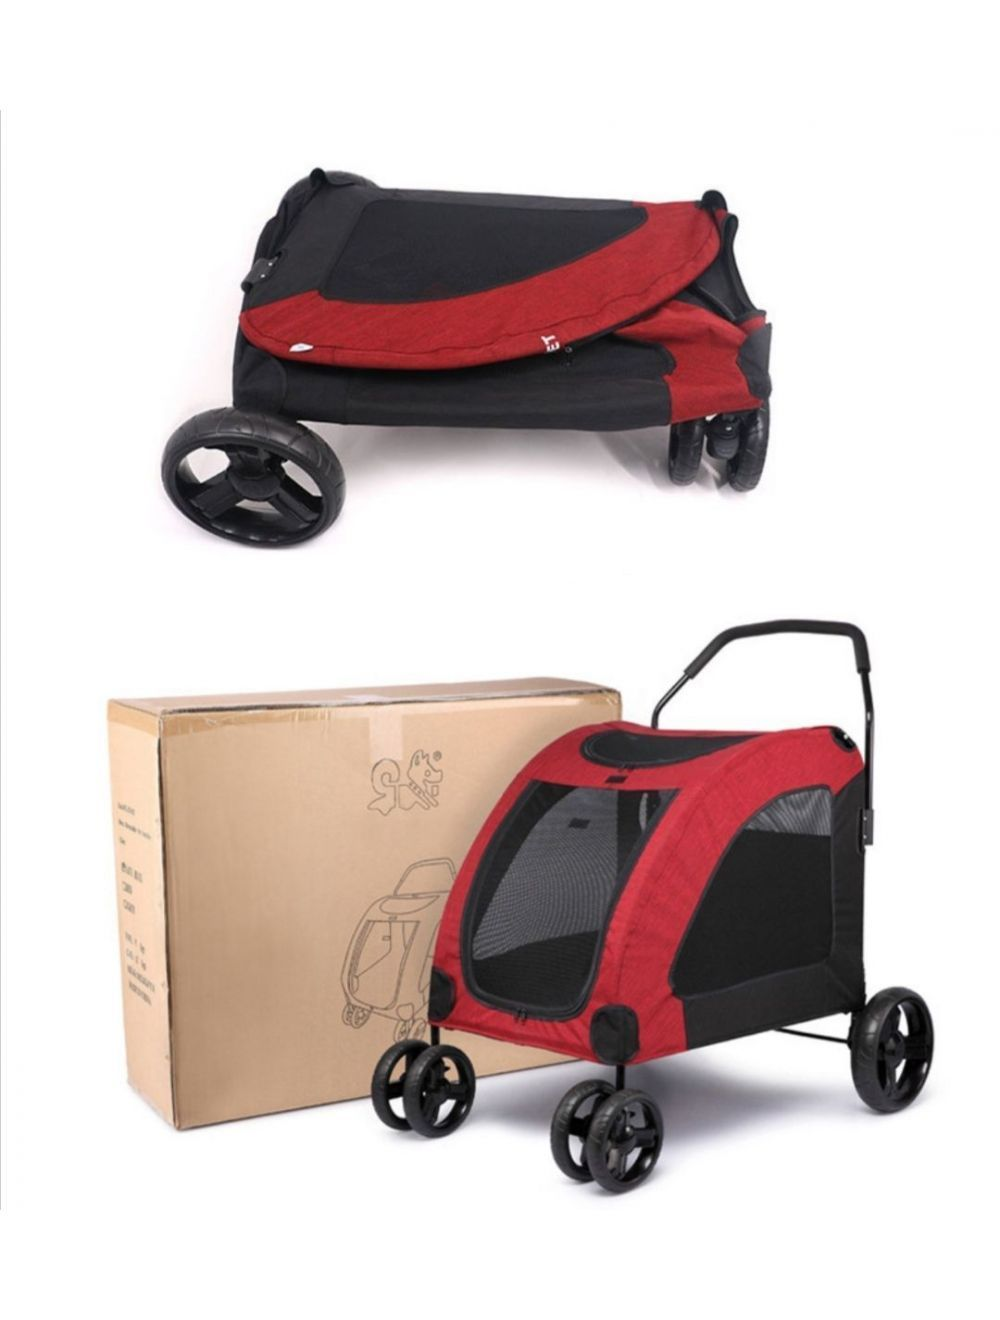 Coche Pet Stroller Grande Color Rojo-Negro